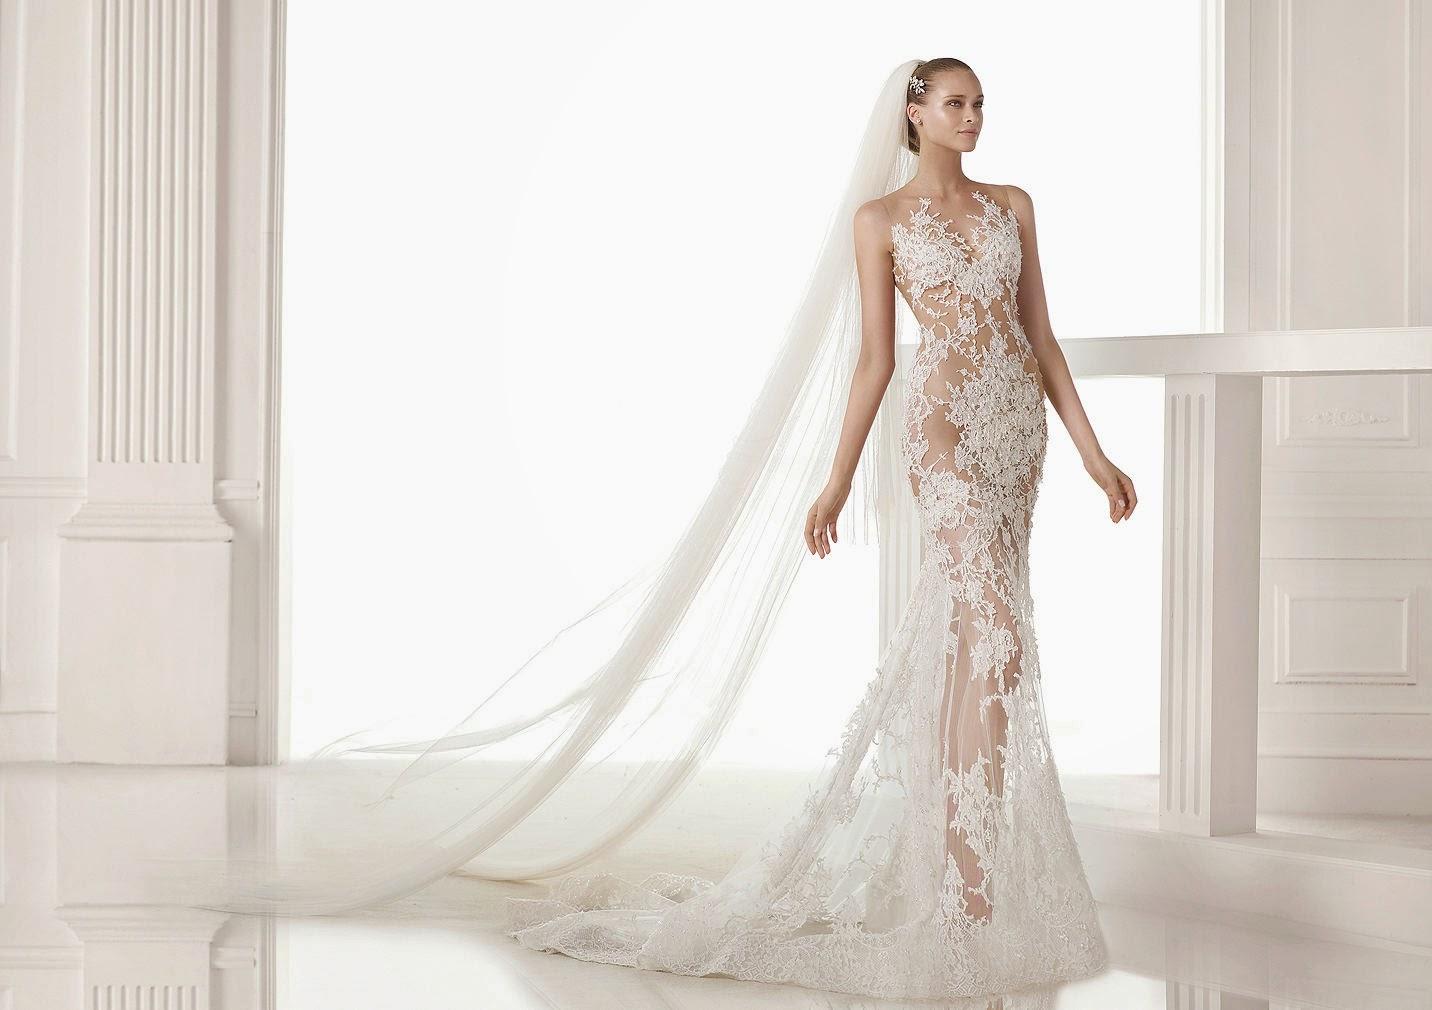 50 Most Elegant Wedding Dresses